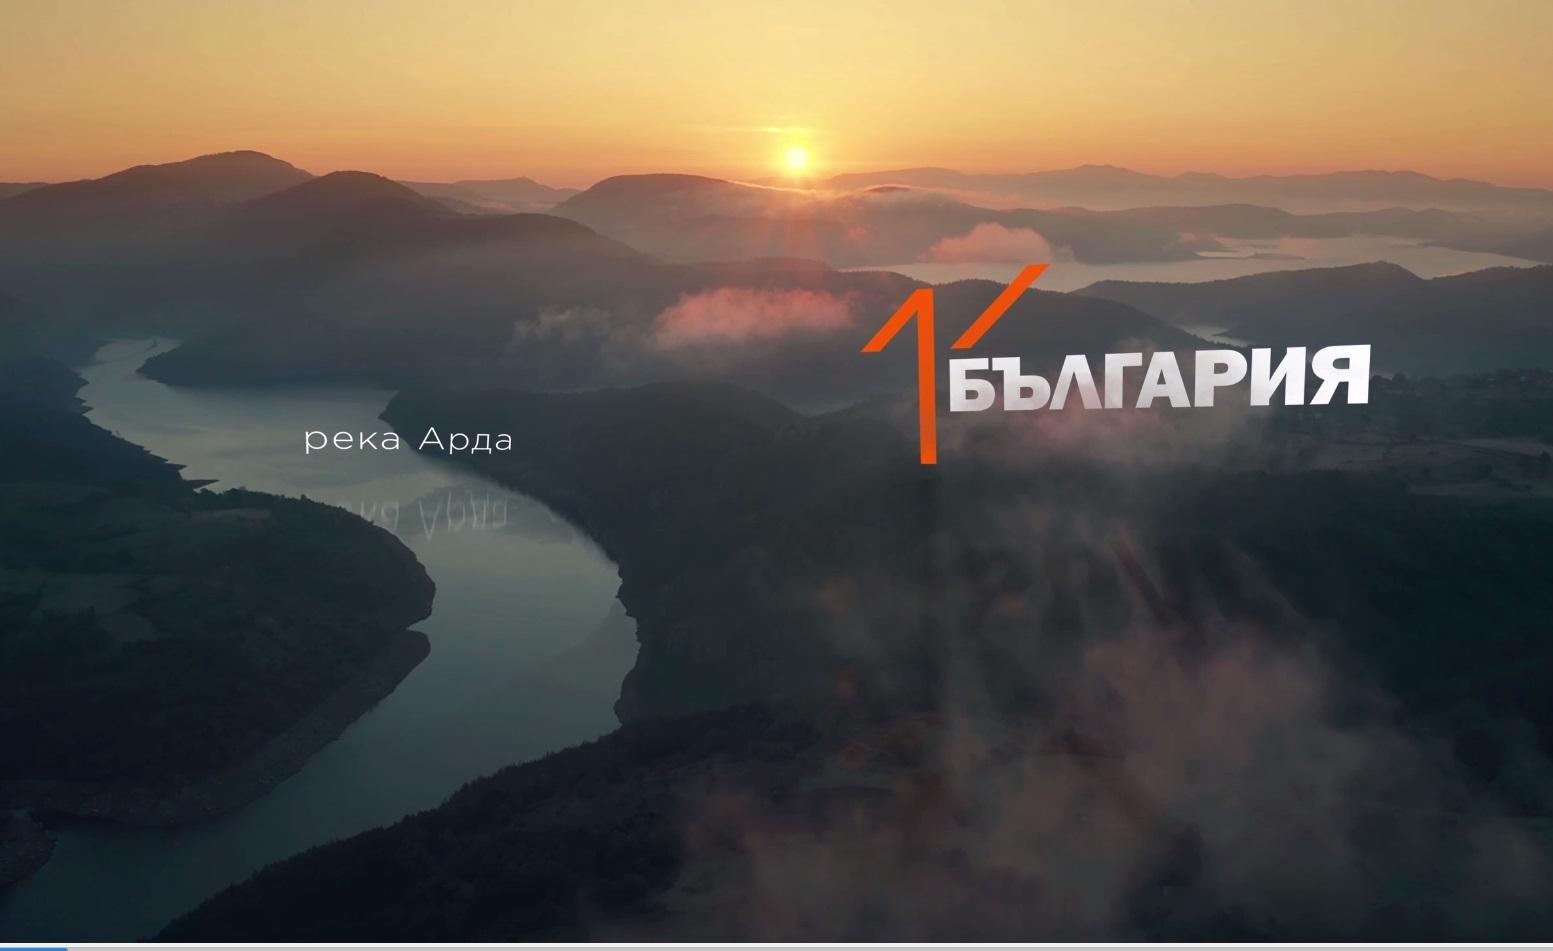 Български екскурзоводи ни водят из малко познати места у нас в рекламни клипове